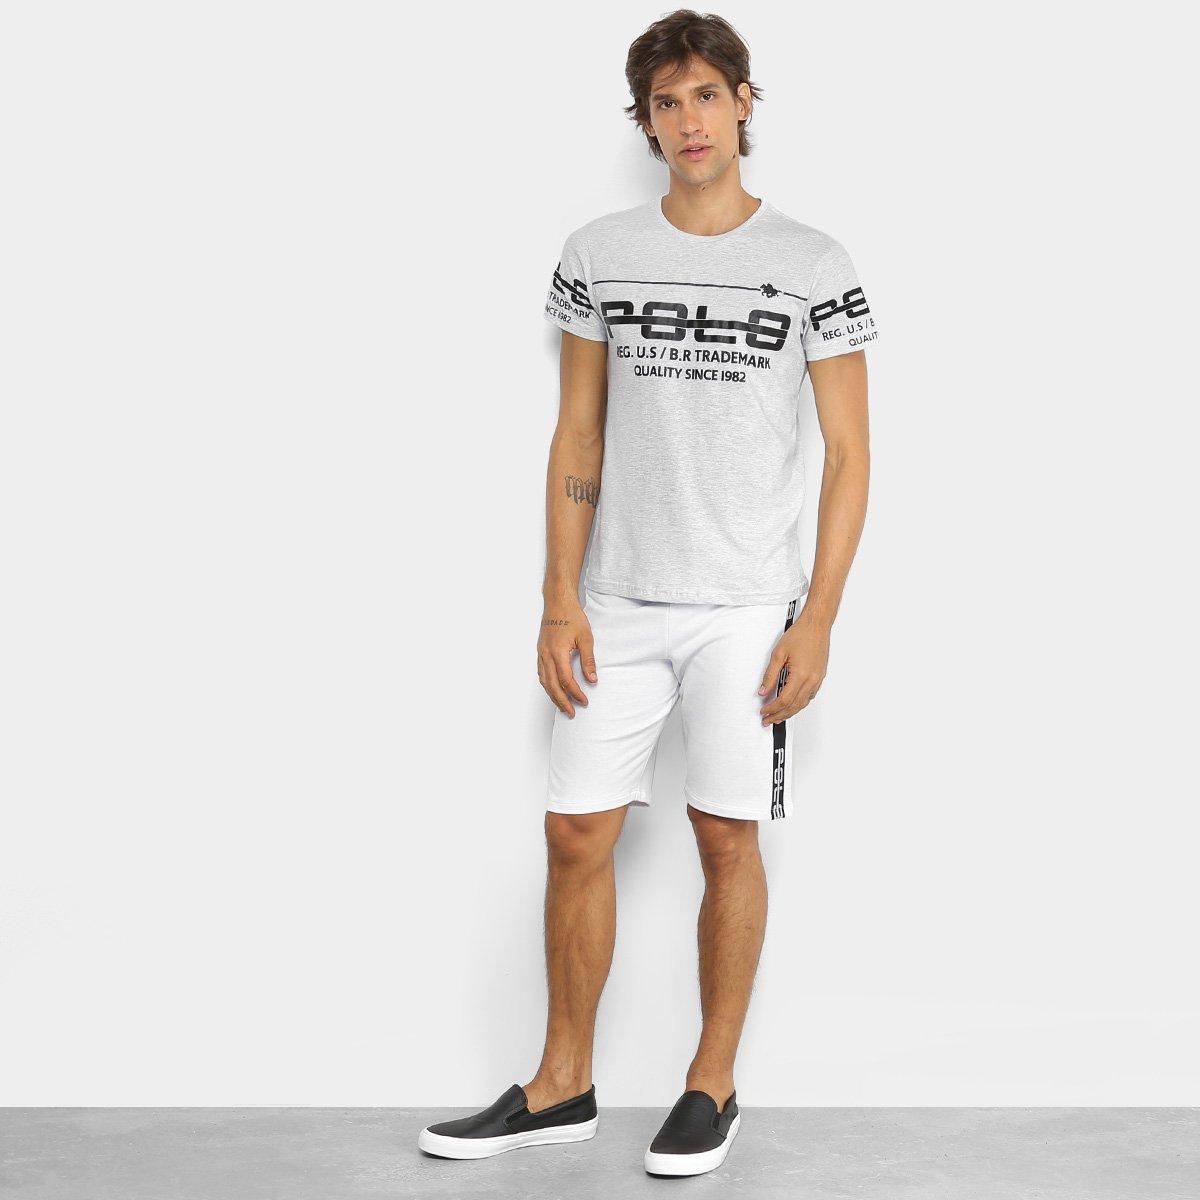 Foto 3 - Camiseta RG 518 Meia Malha Estampada Masculina